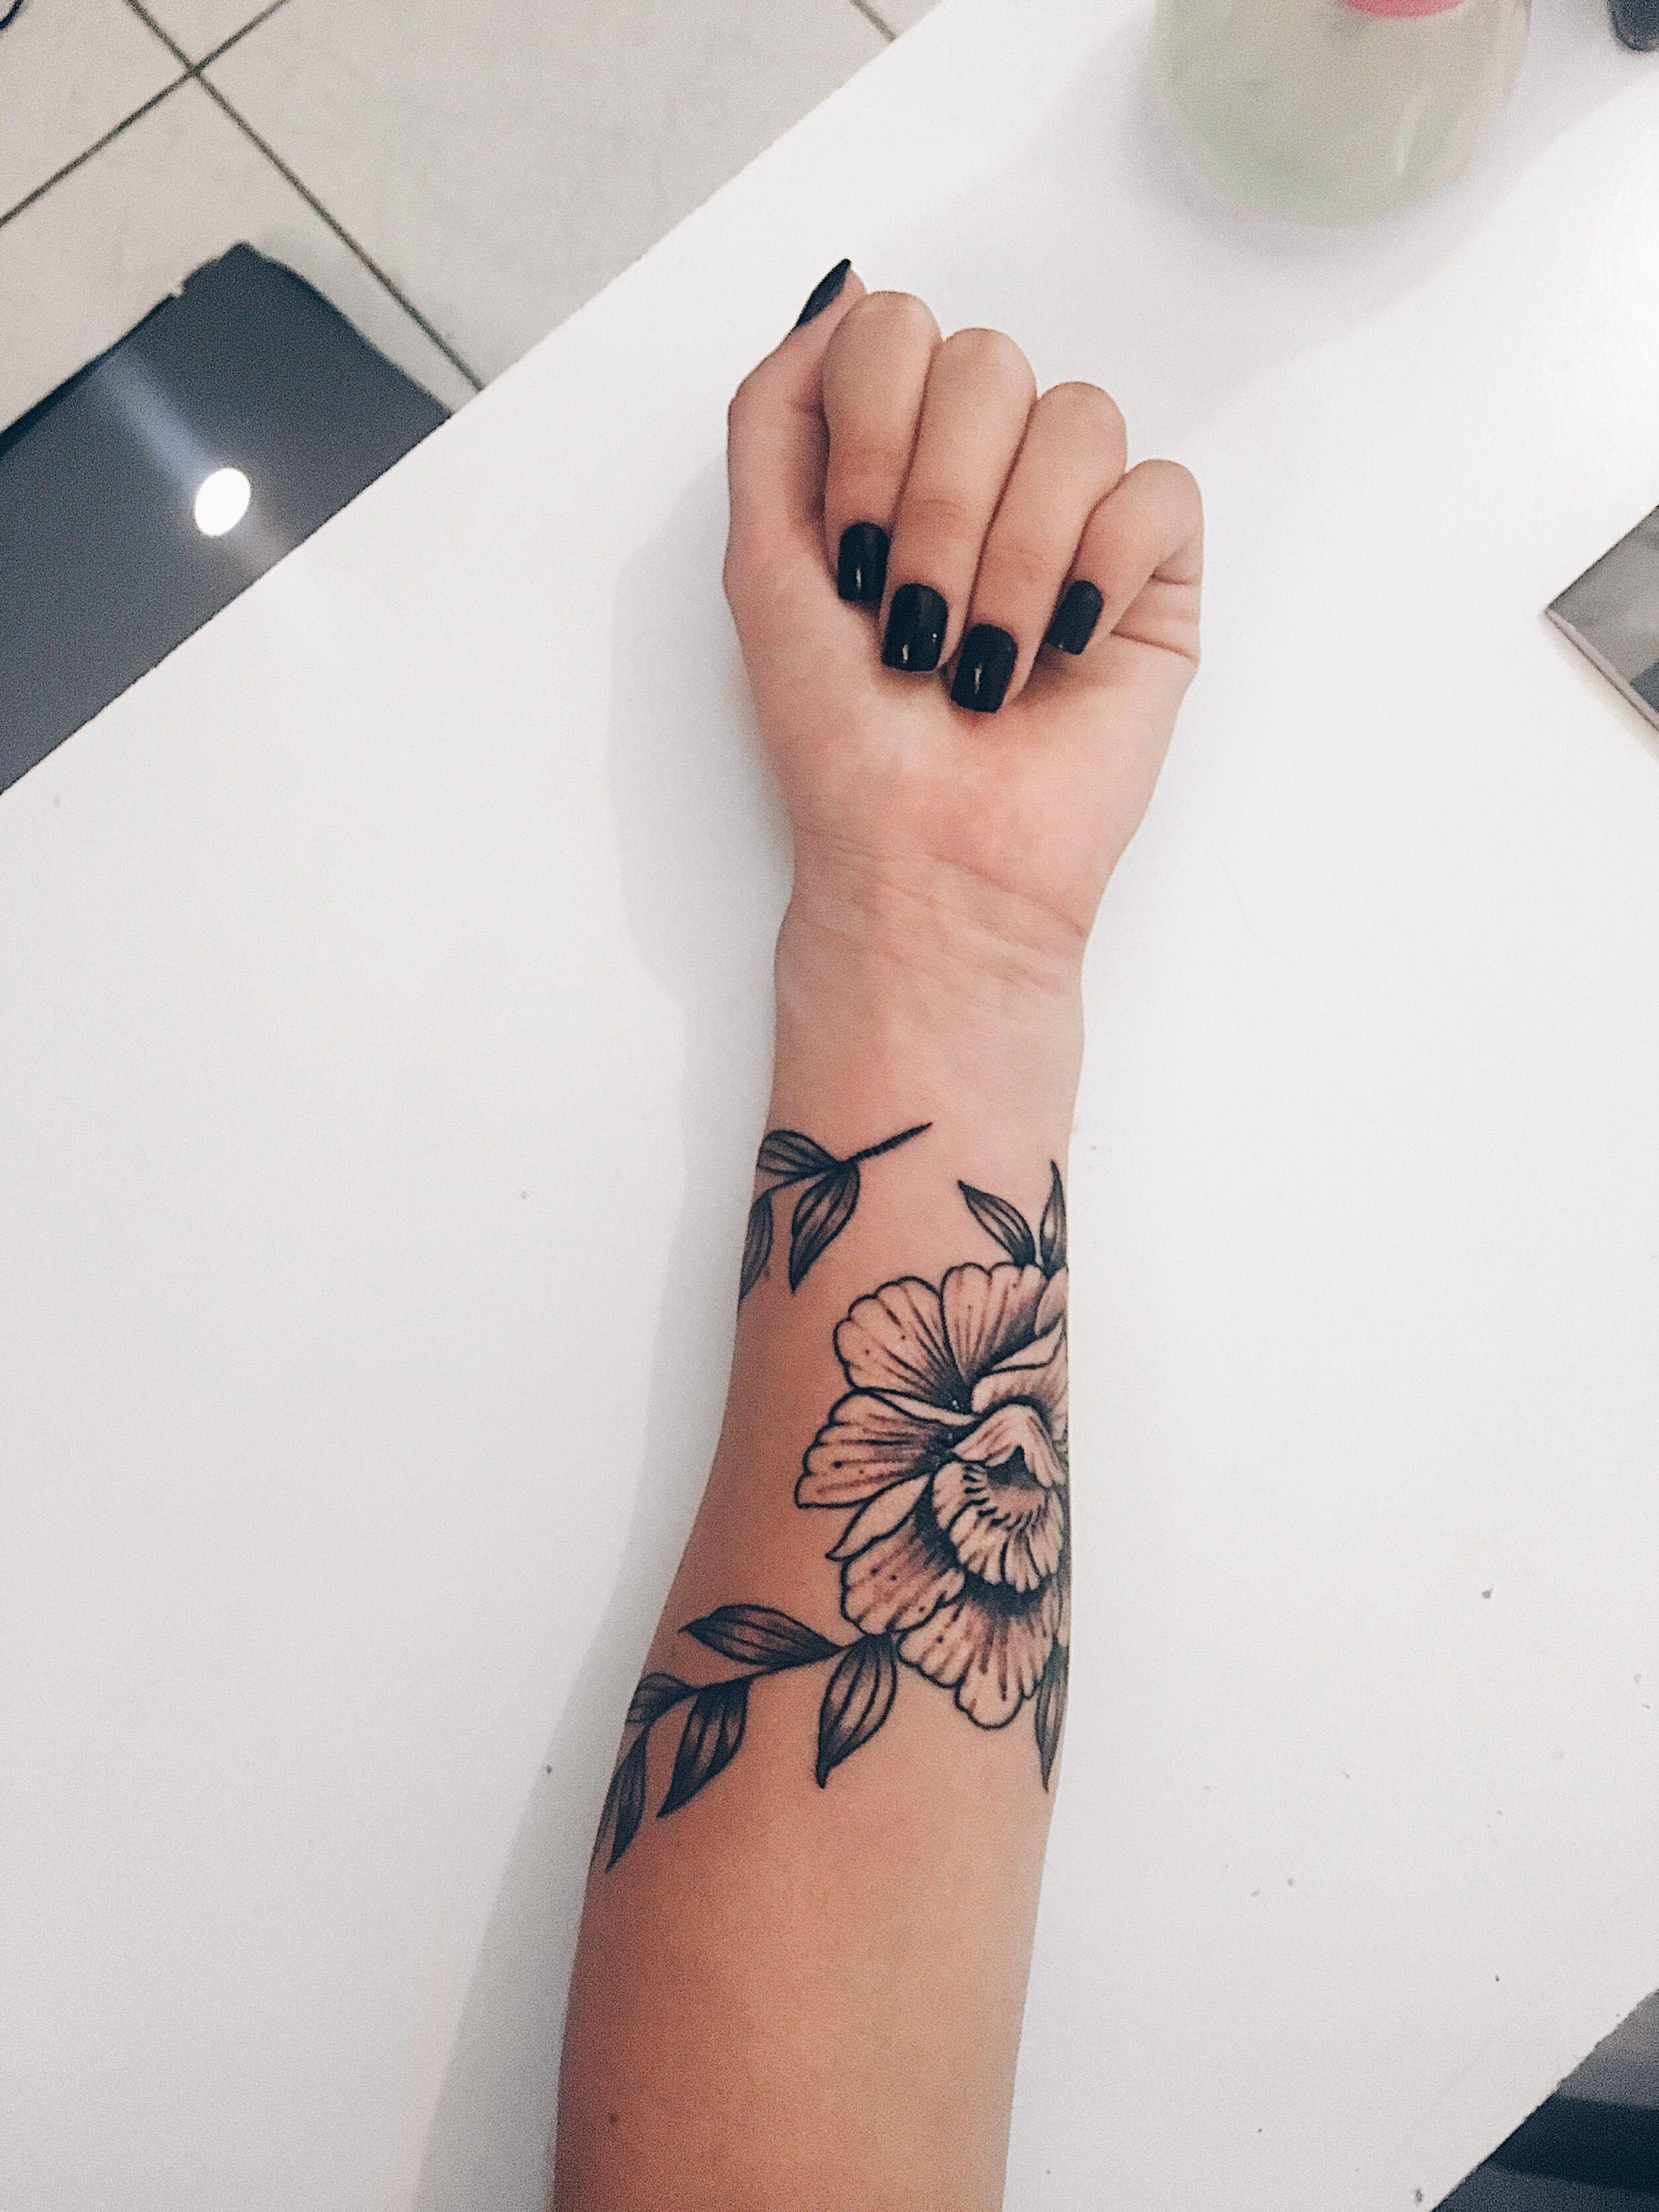 Pin de Tatiane Martins em tatoo | Minitatuagens, Tatuagens belas, Tatuagens  exclusivas